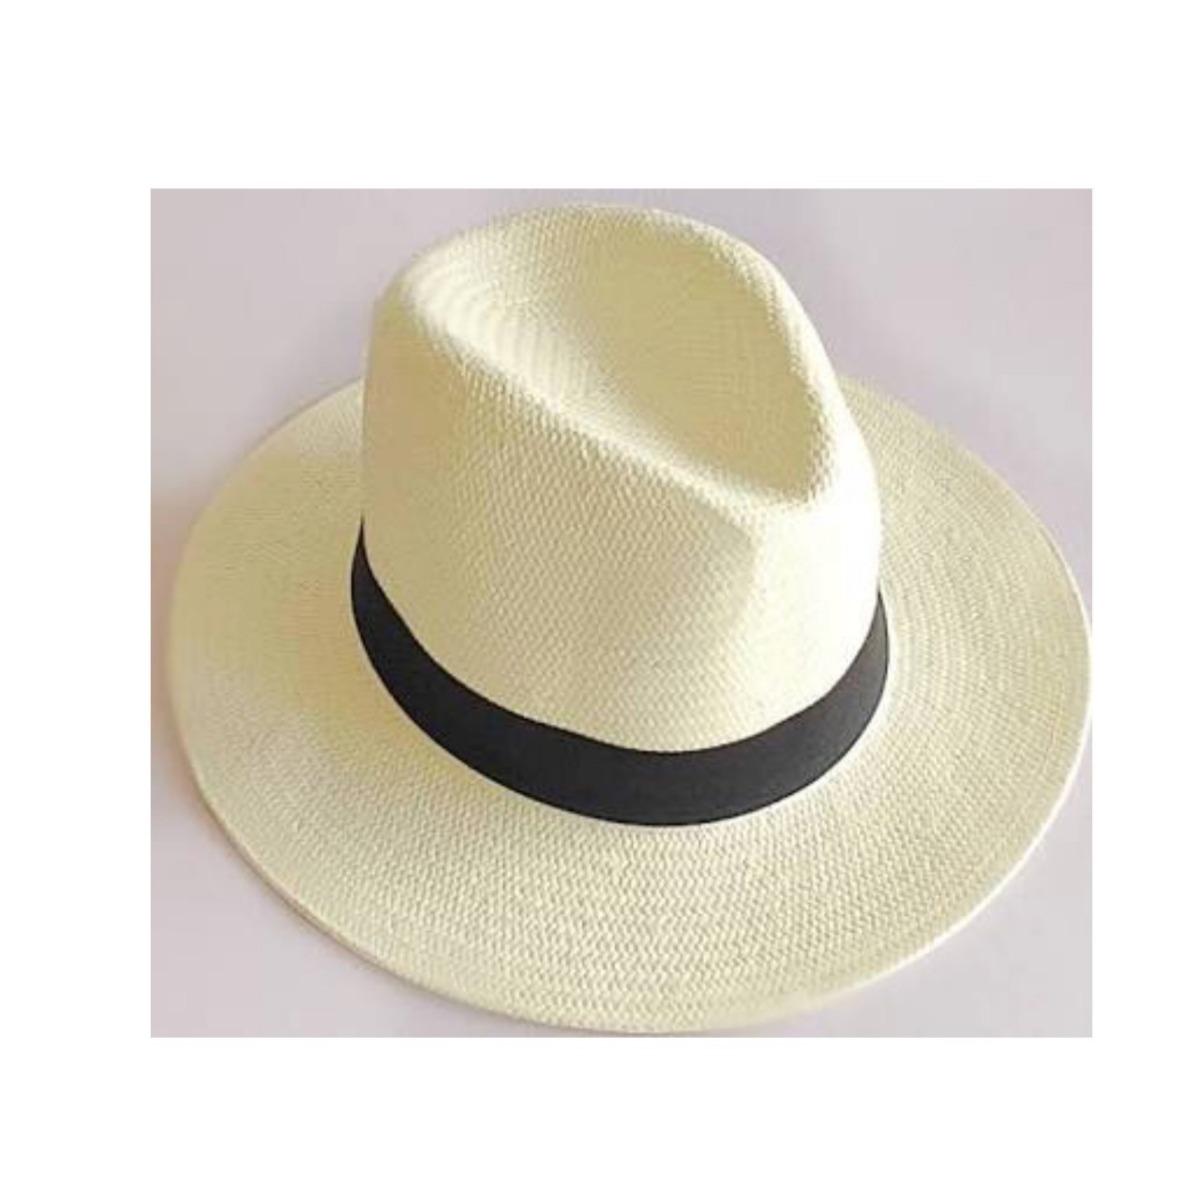 chapéu estilo panamá masculino feminino praia pronta entrega. Carregando  zoom. 1192d0286cc